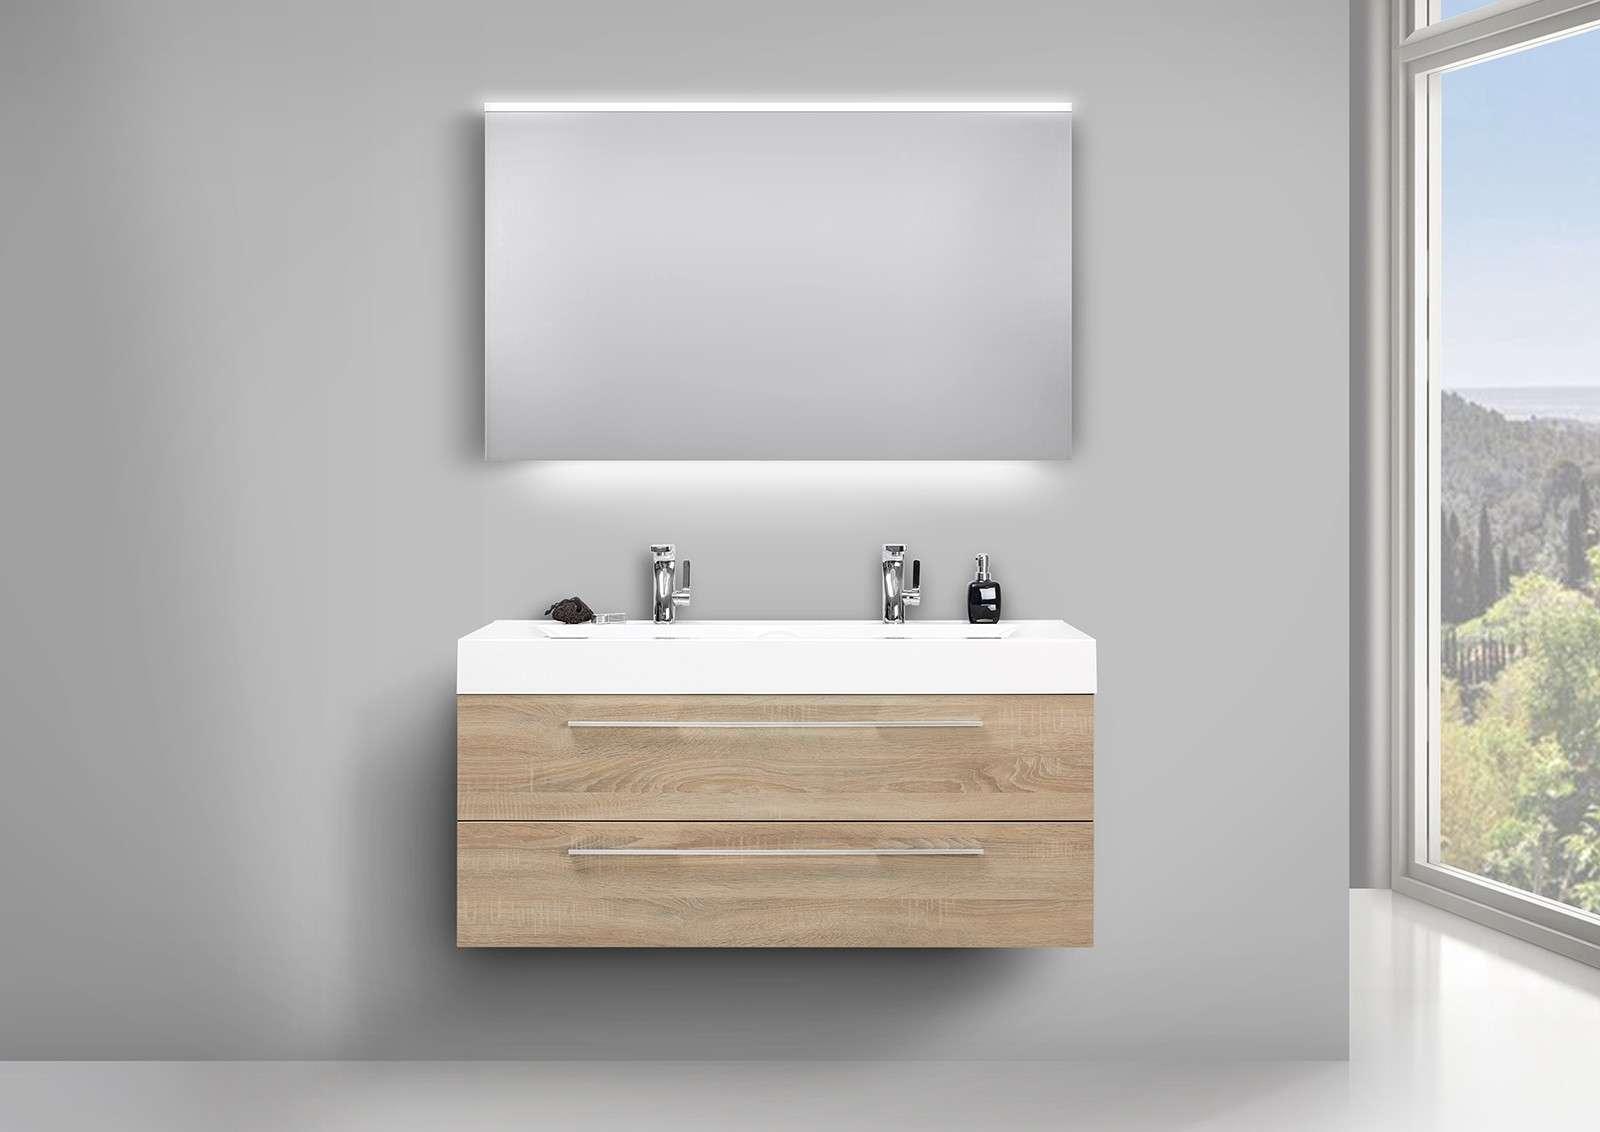 Badezimmer Unterschrank Schweiz | Slagerijstok